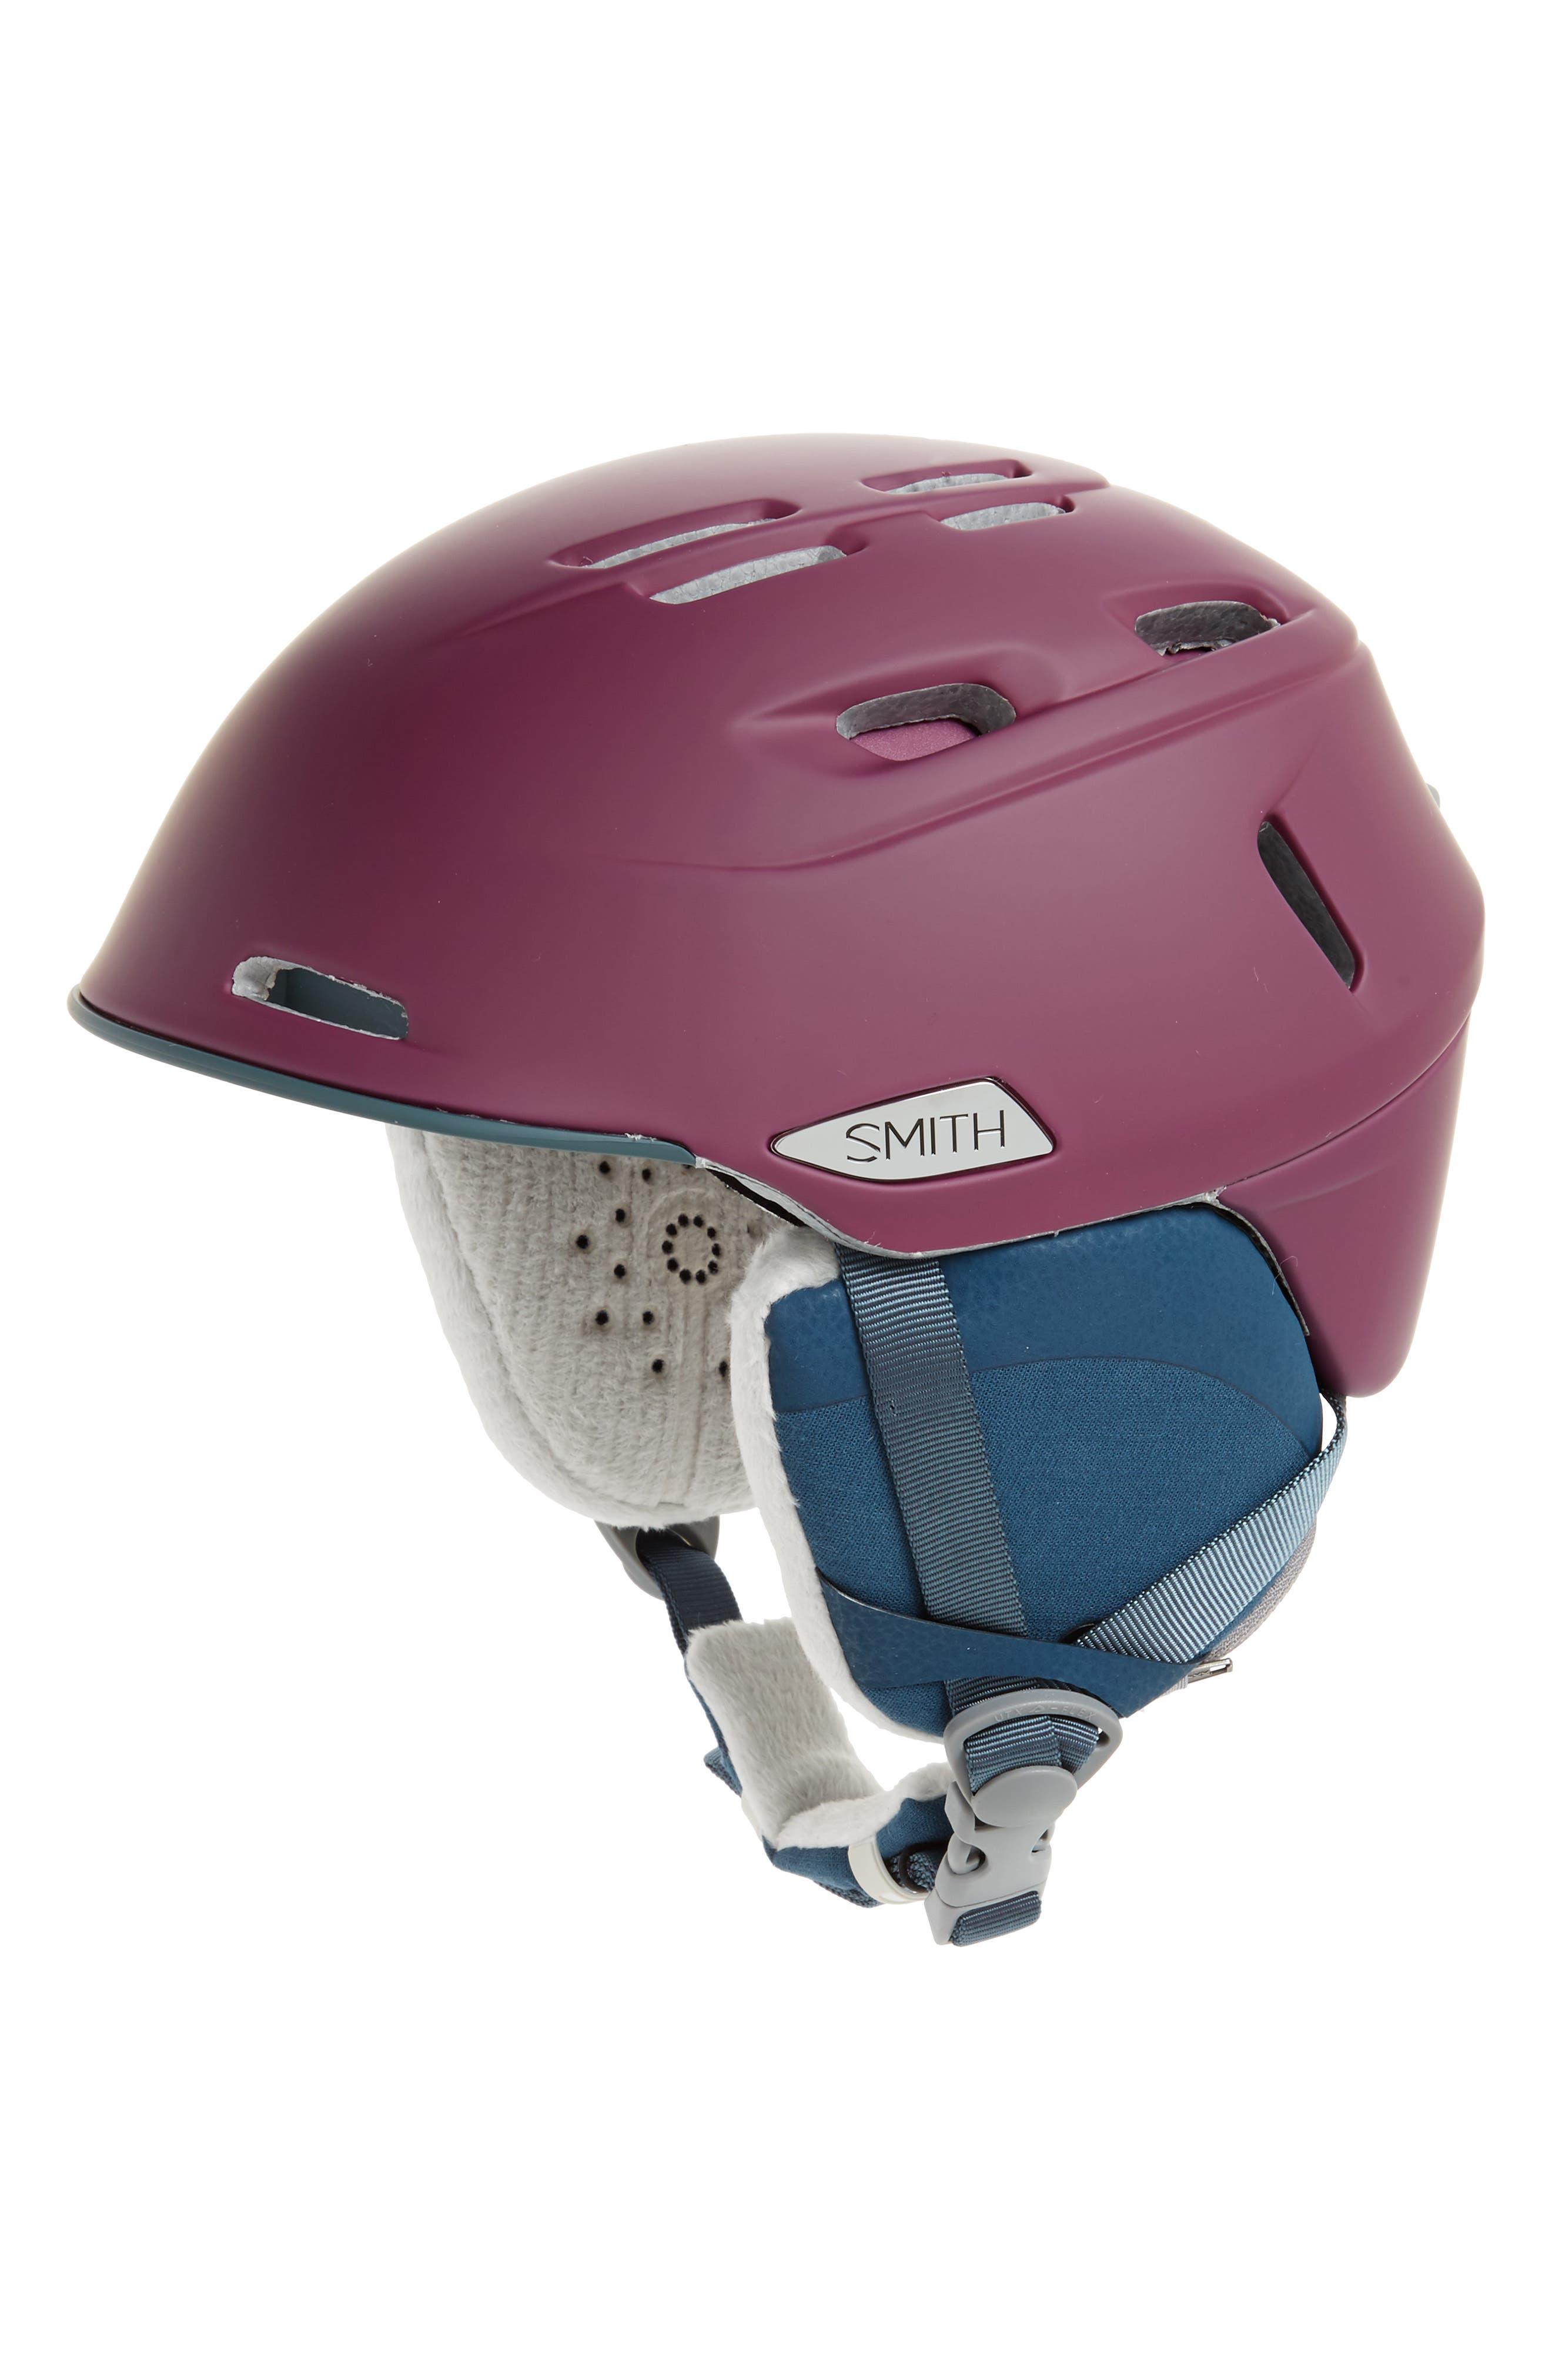 Alternate Image 1 Selected - Smith 'Compass' Snow Helmet